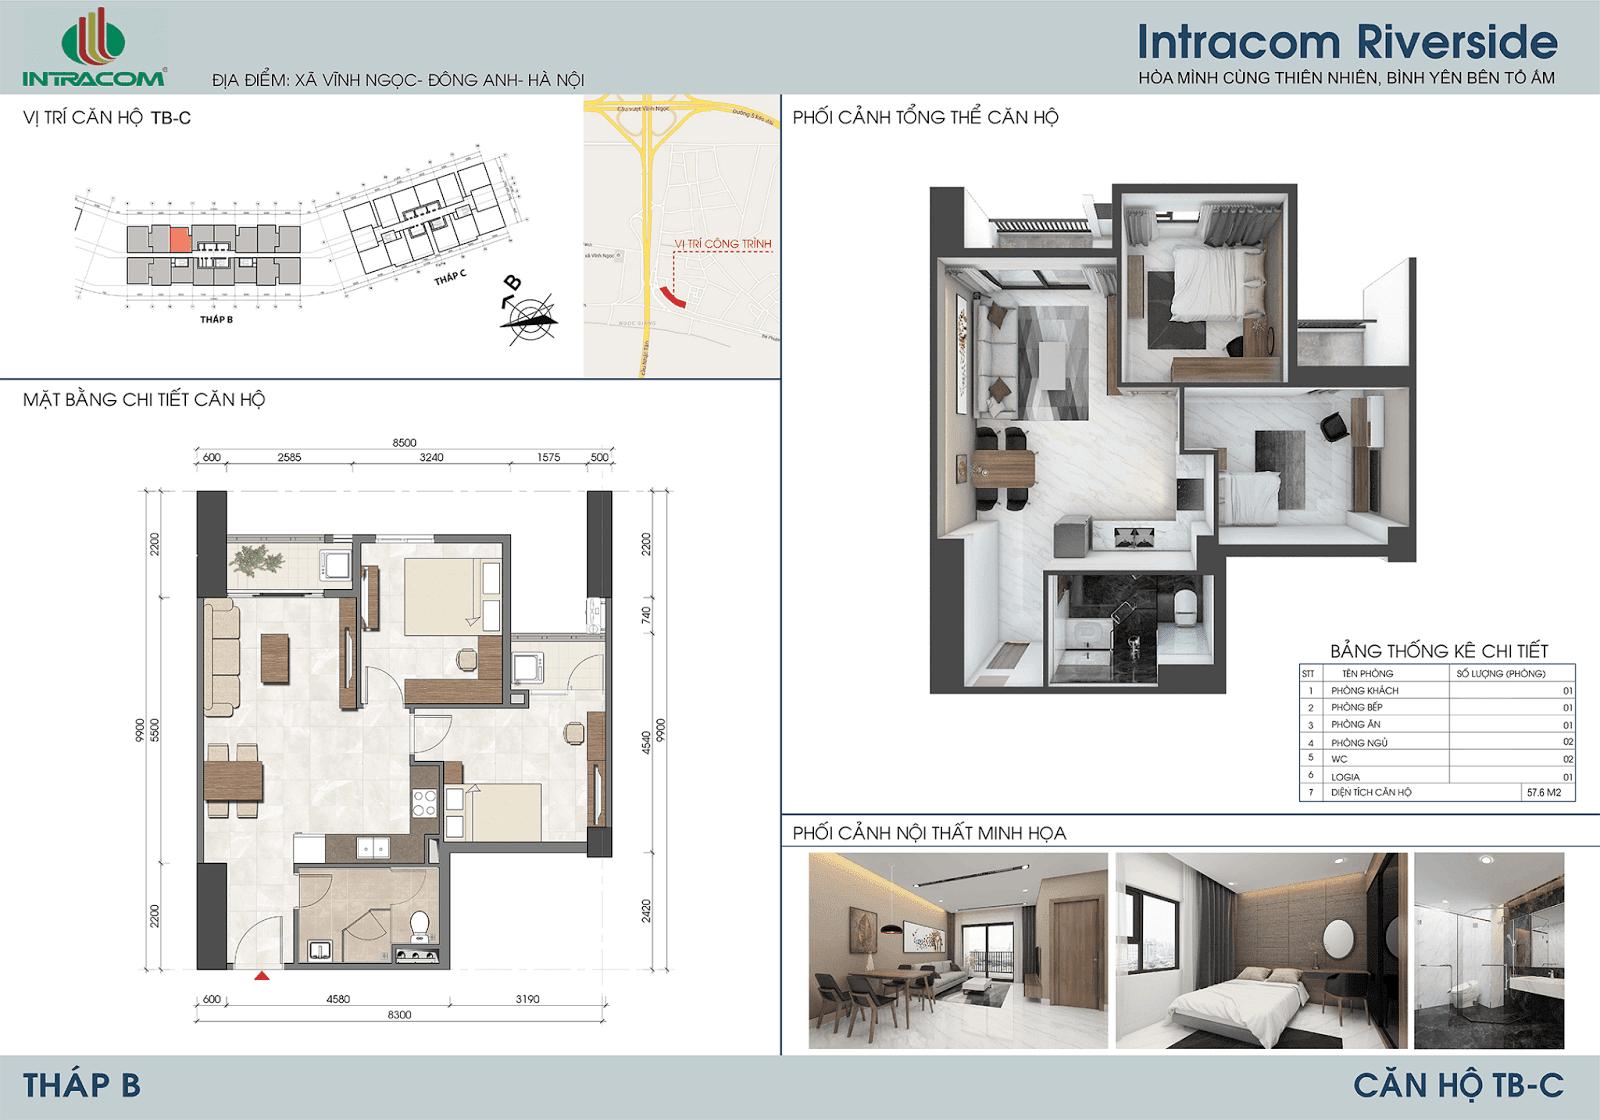 Thiết kế căn 03 - 06 - 57,6m2